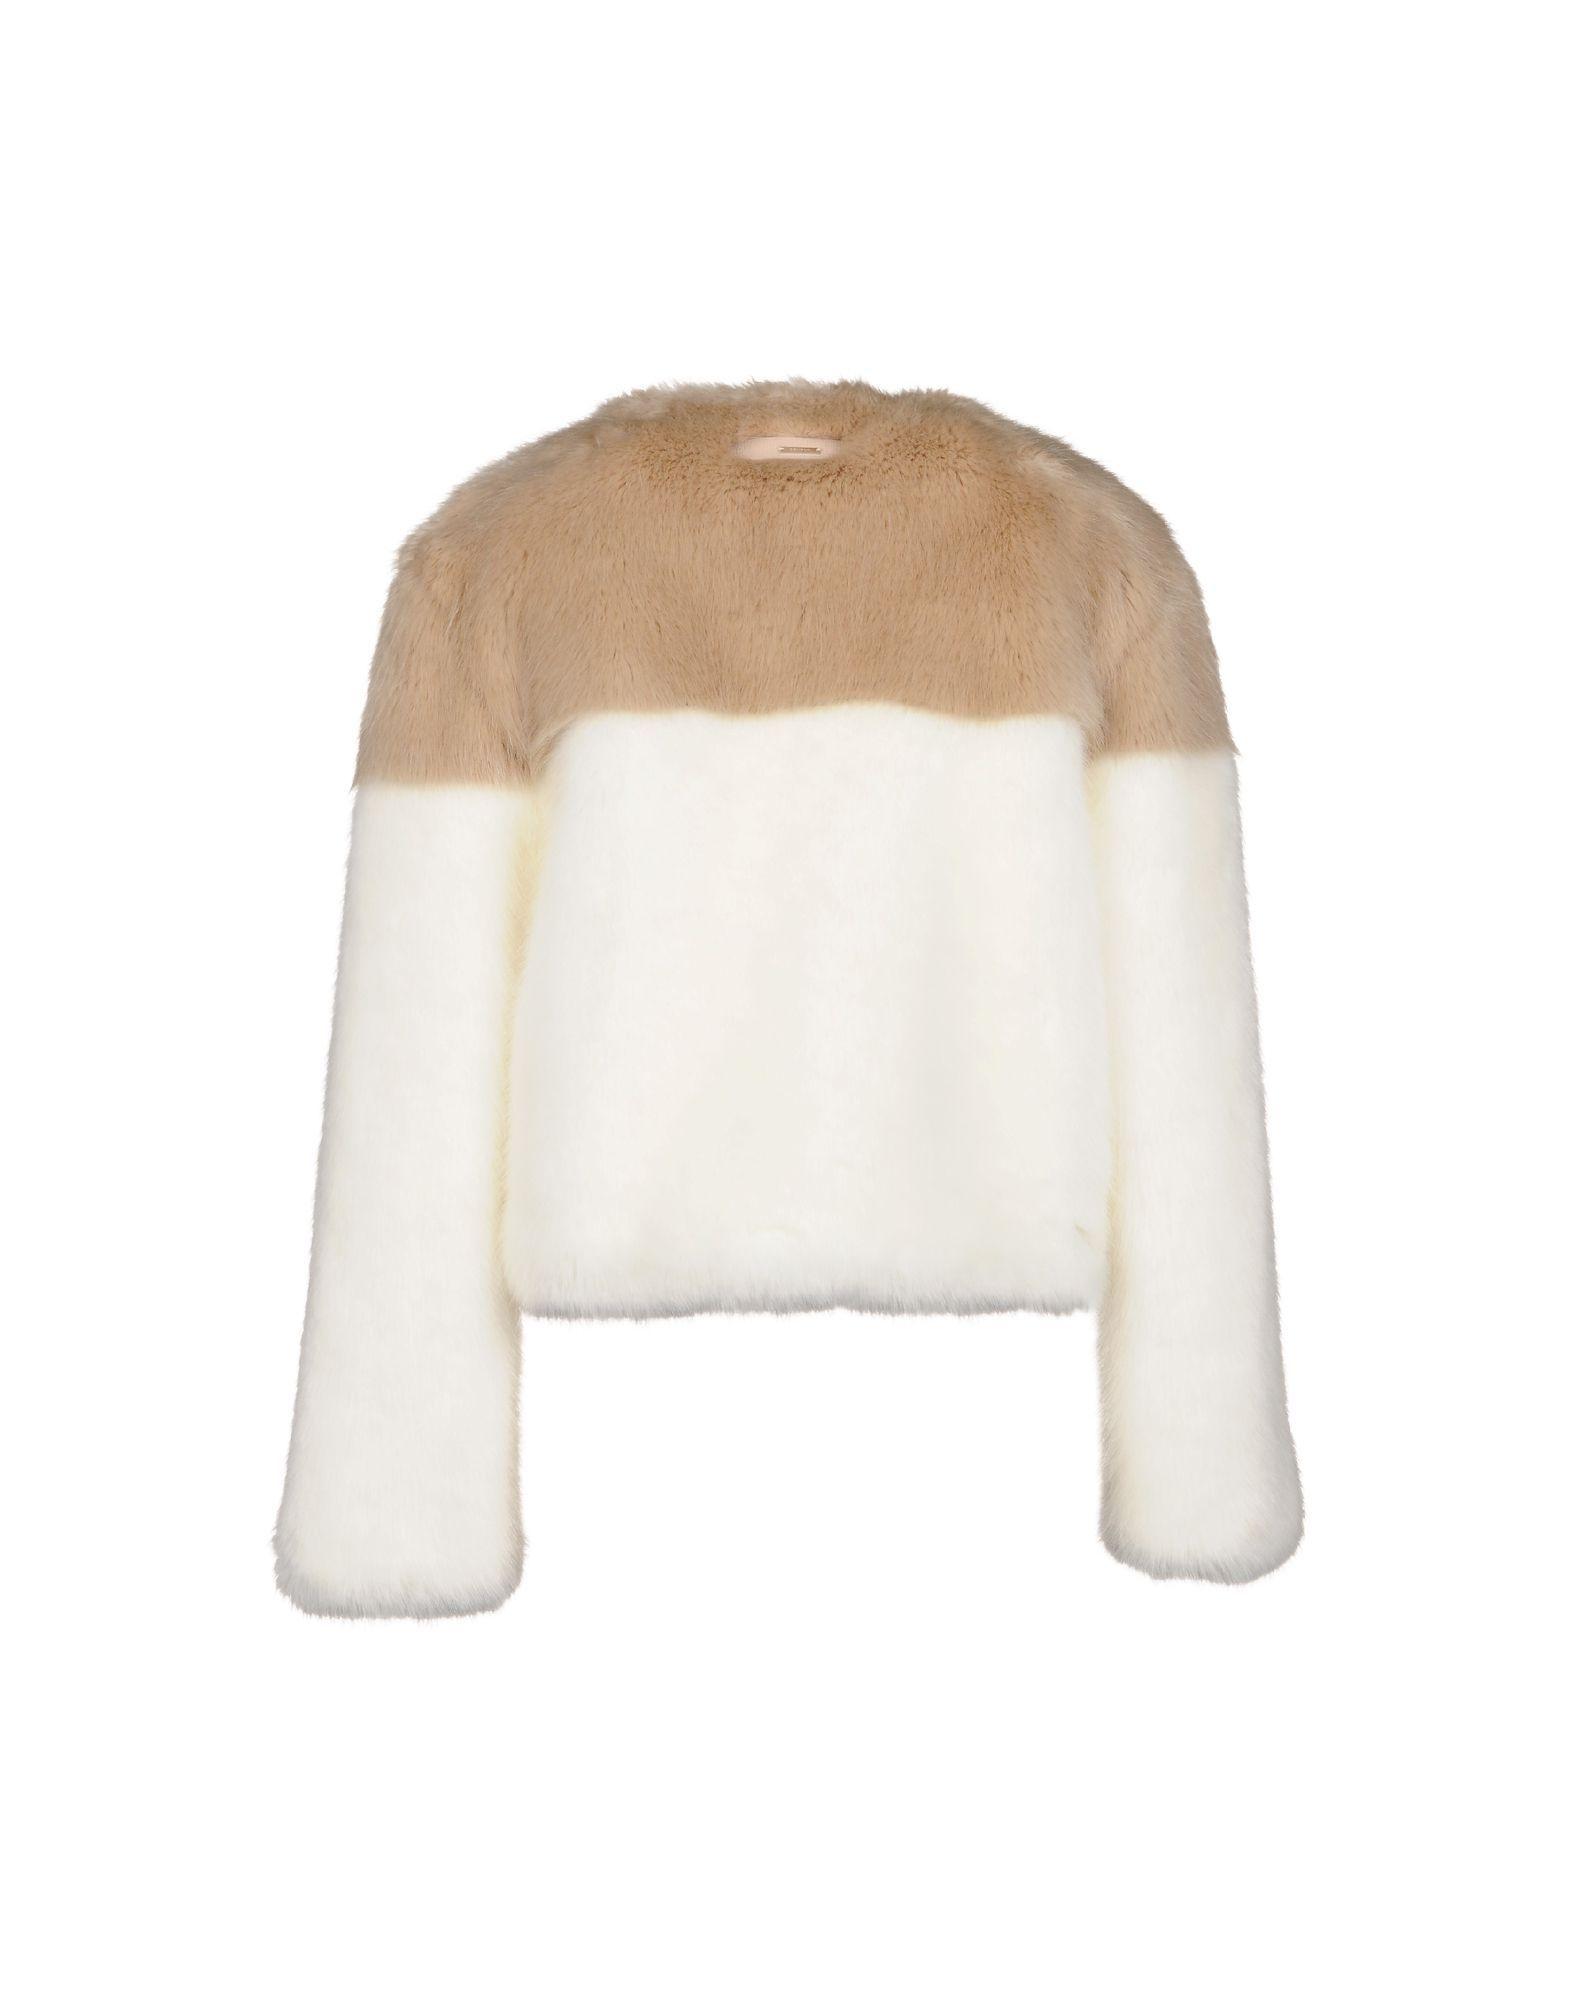 Dondup Women's Teddy Coat Modacrylic